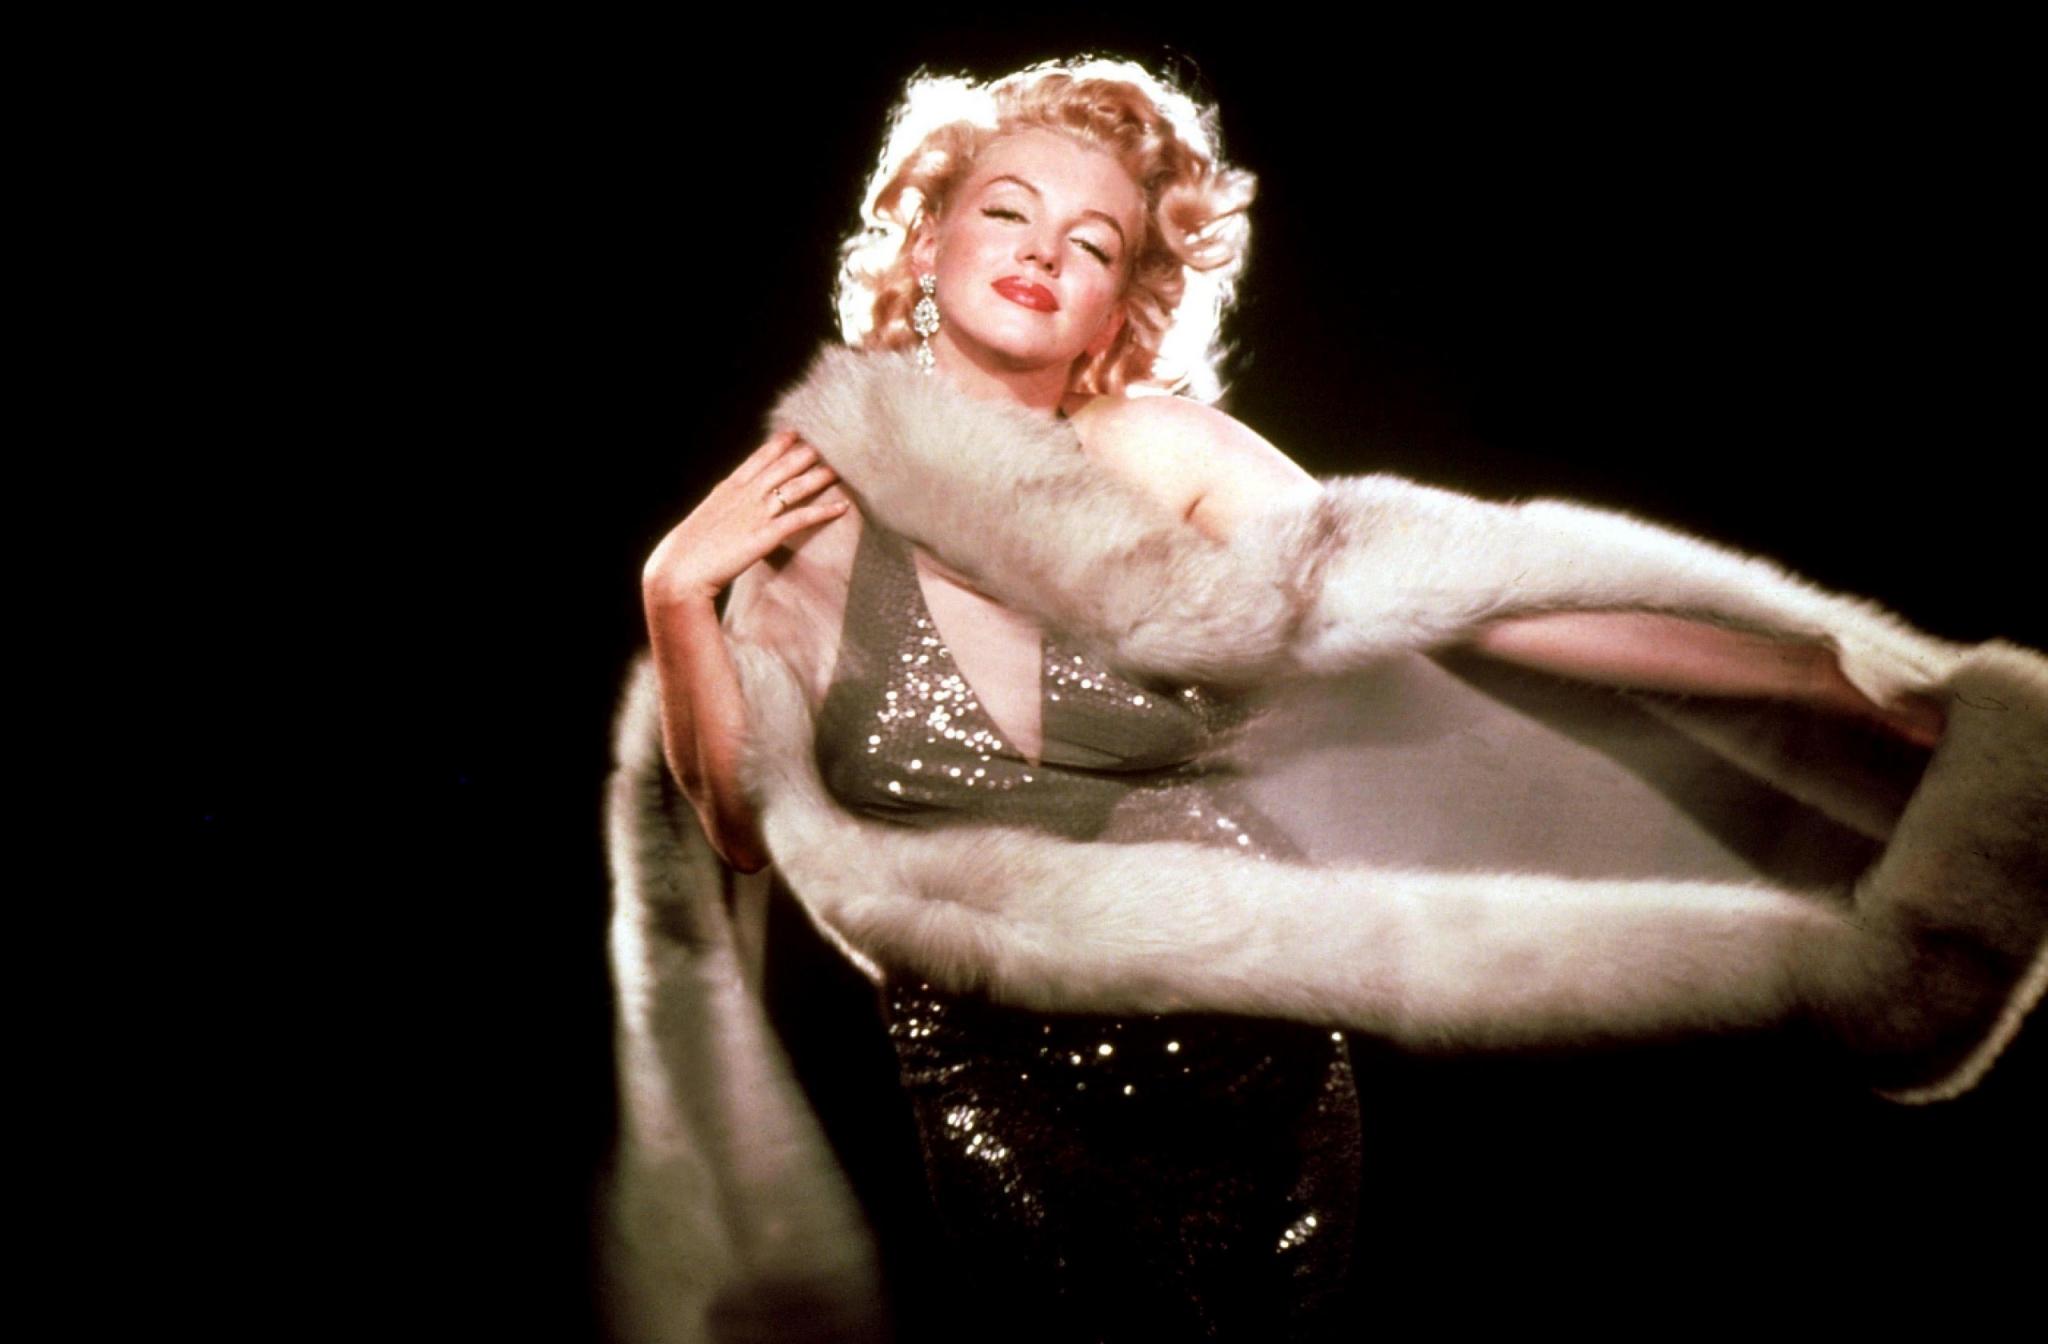 Beautiful Marilyn Monroe Wallpapers For IPhone Devlounge 2048x1344